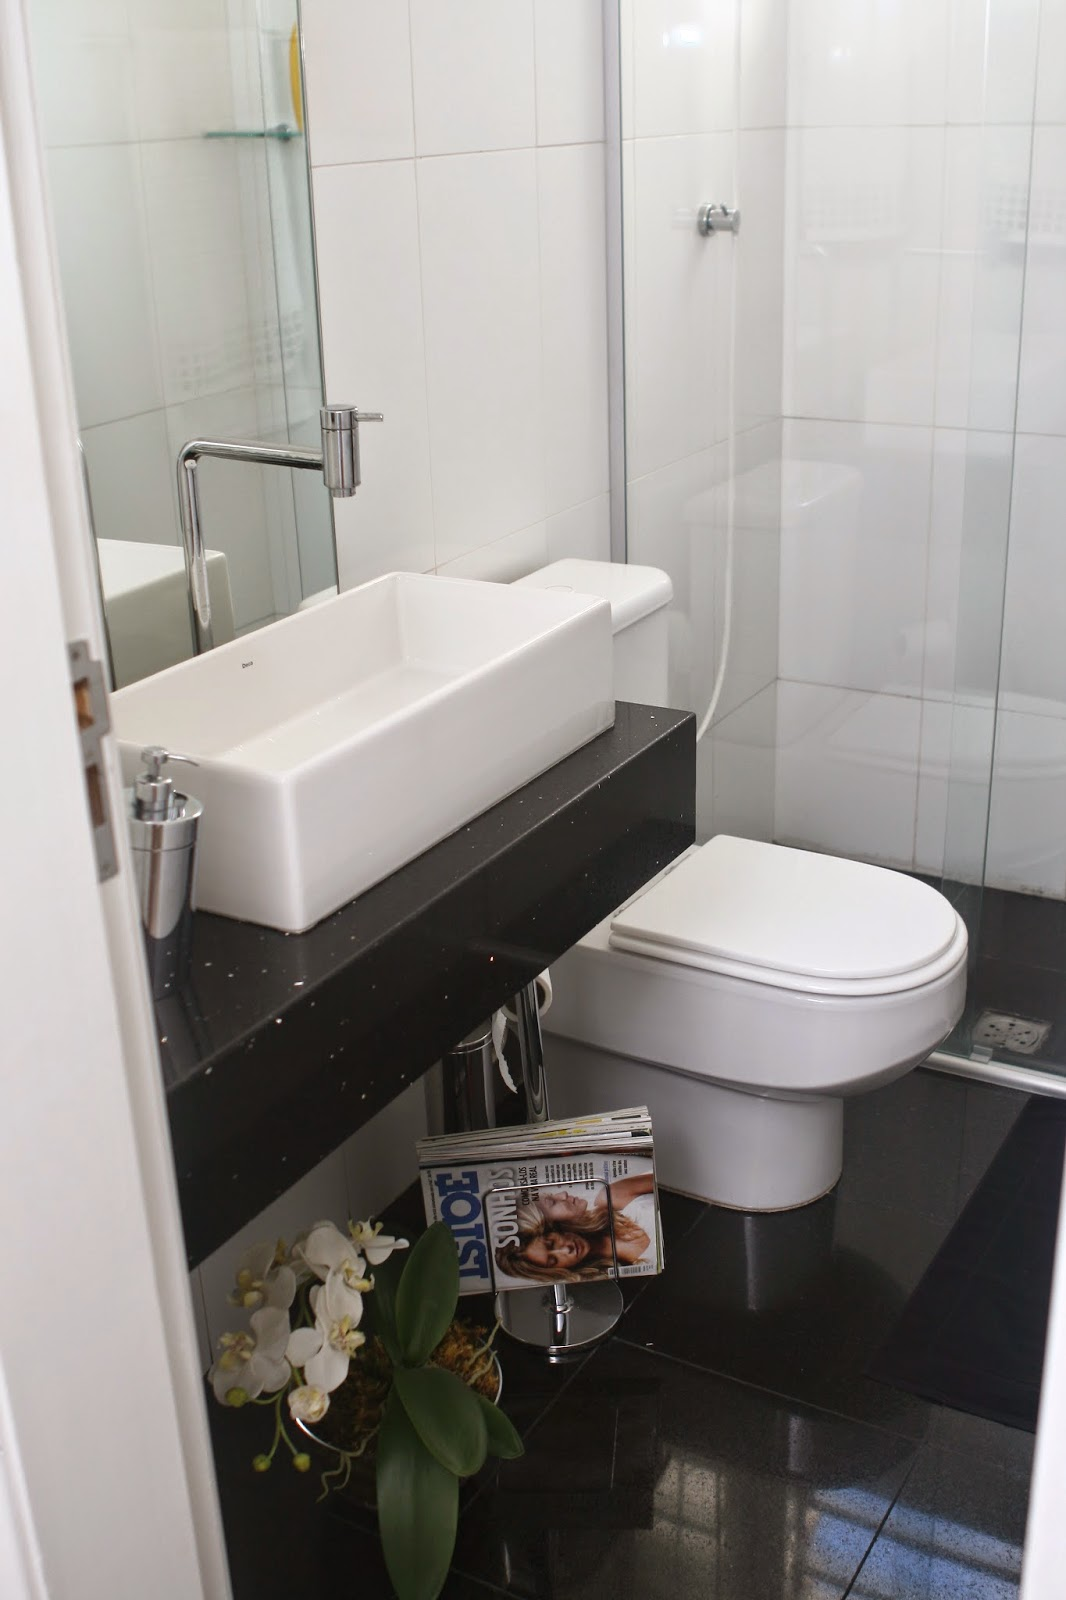 Construindo Minha Casa Clean Banheiros e Lavabos com Bancadas Pretas! Inspir -> Cuba Banheiro Joinville